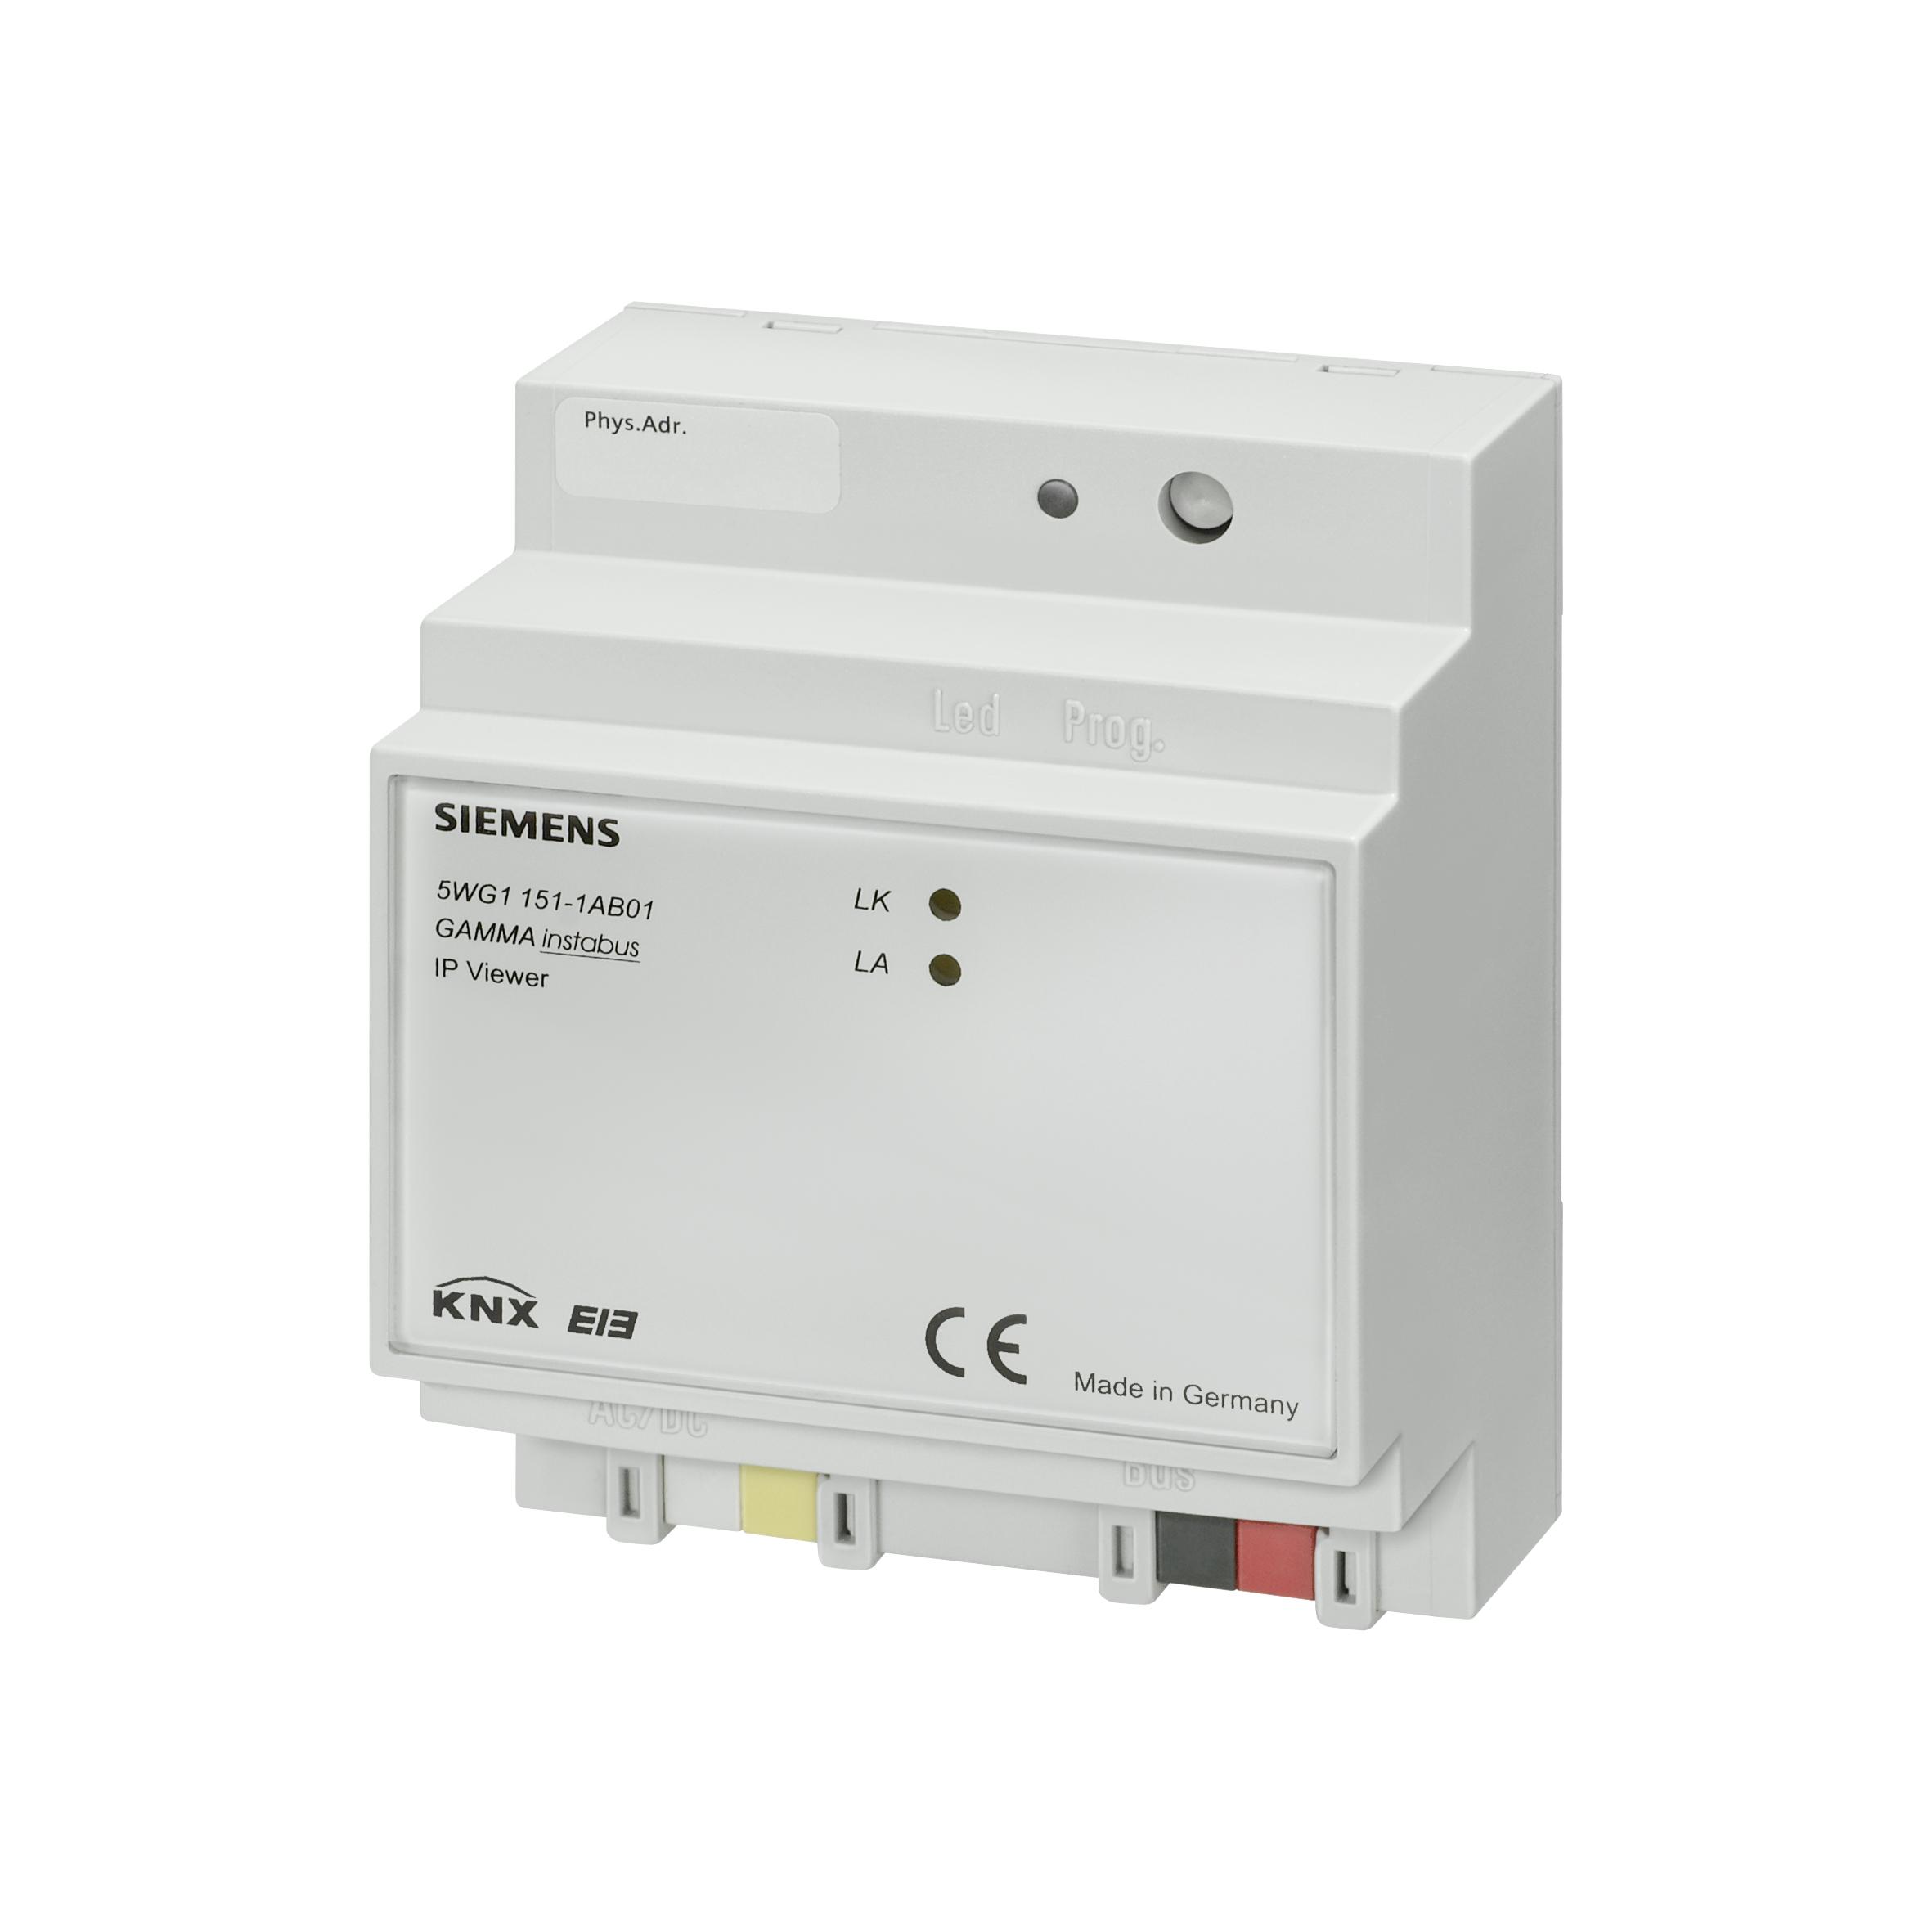 1 Stk IP Viewer KX1511AB01